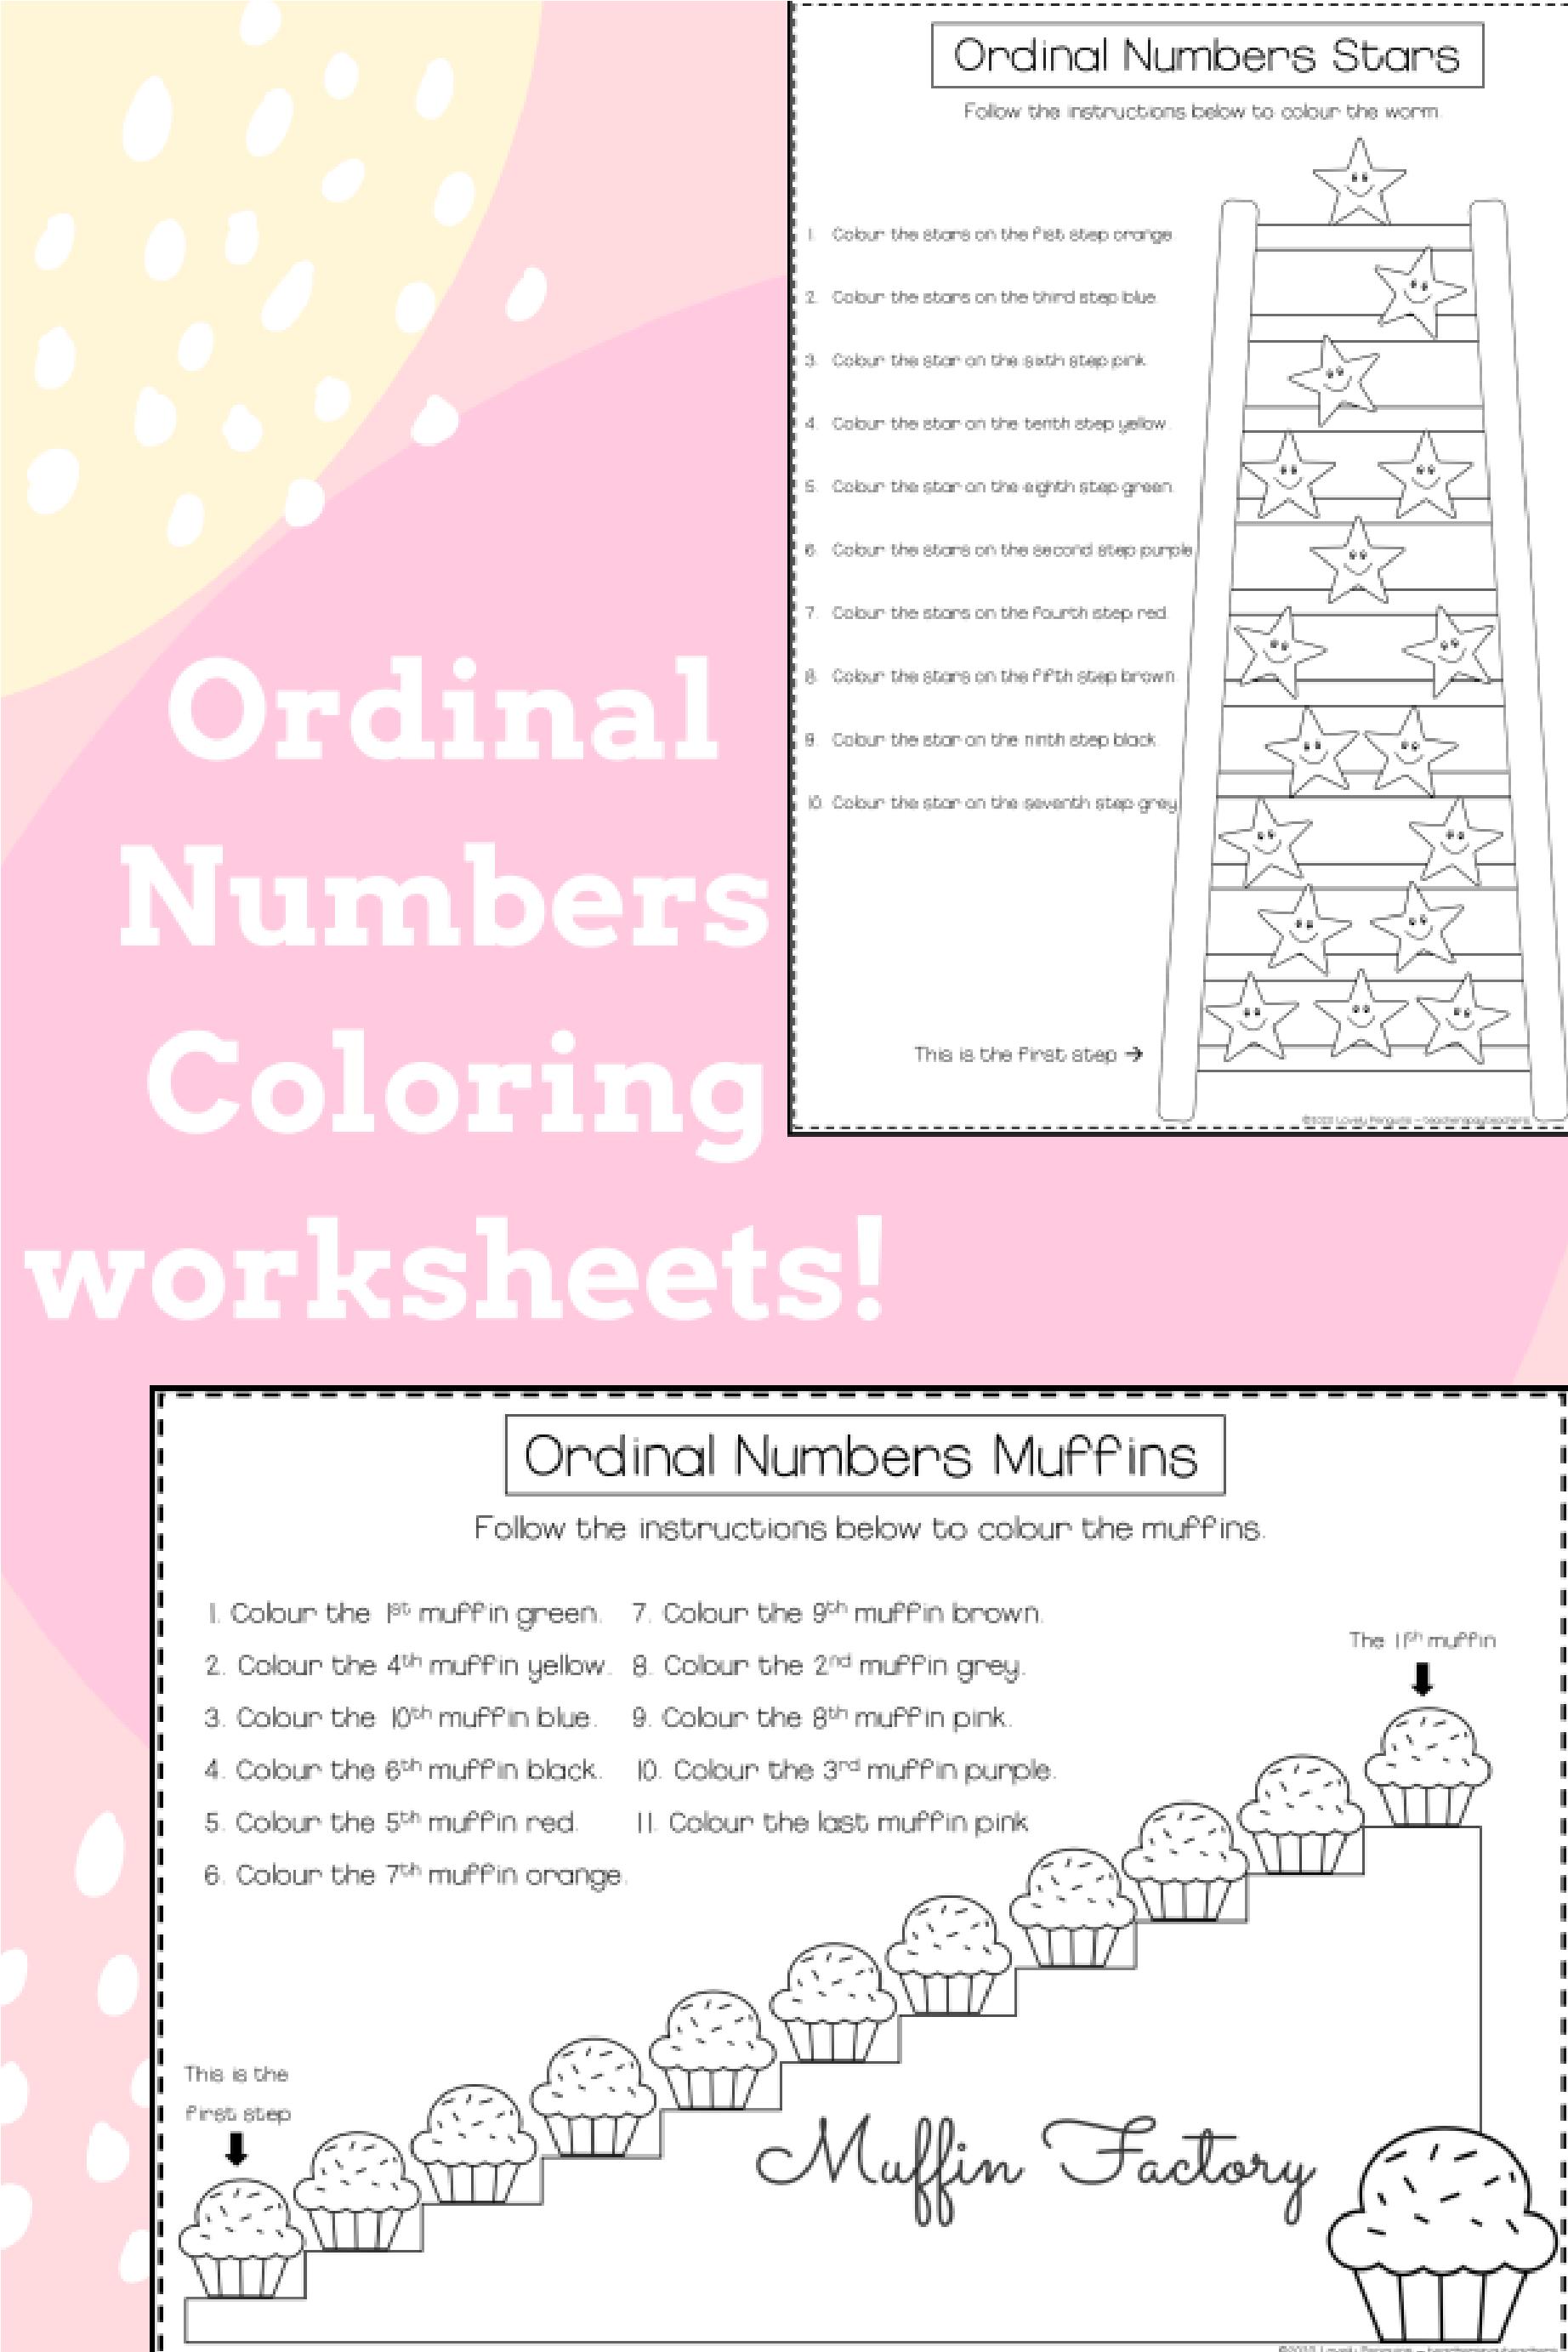 Ordinal Numbers Coloring Worksheets In